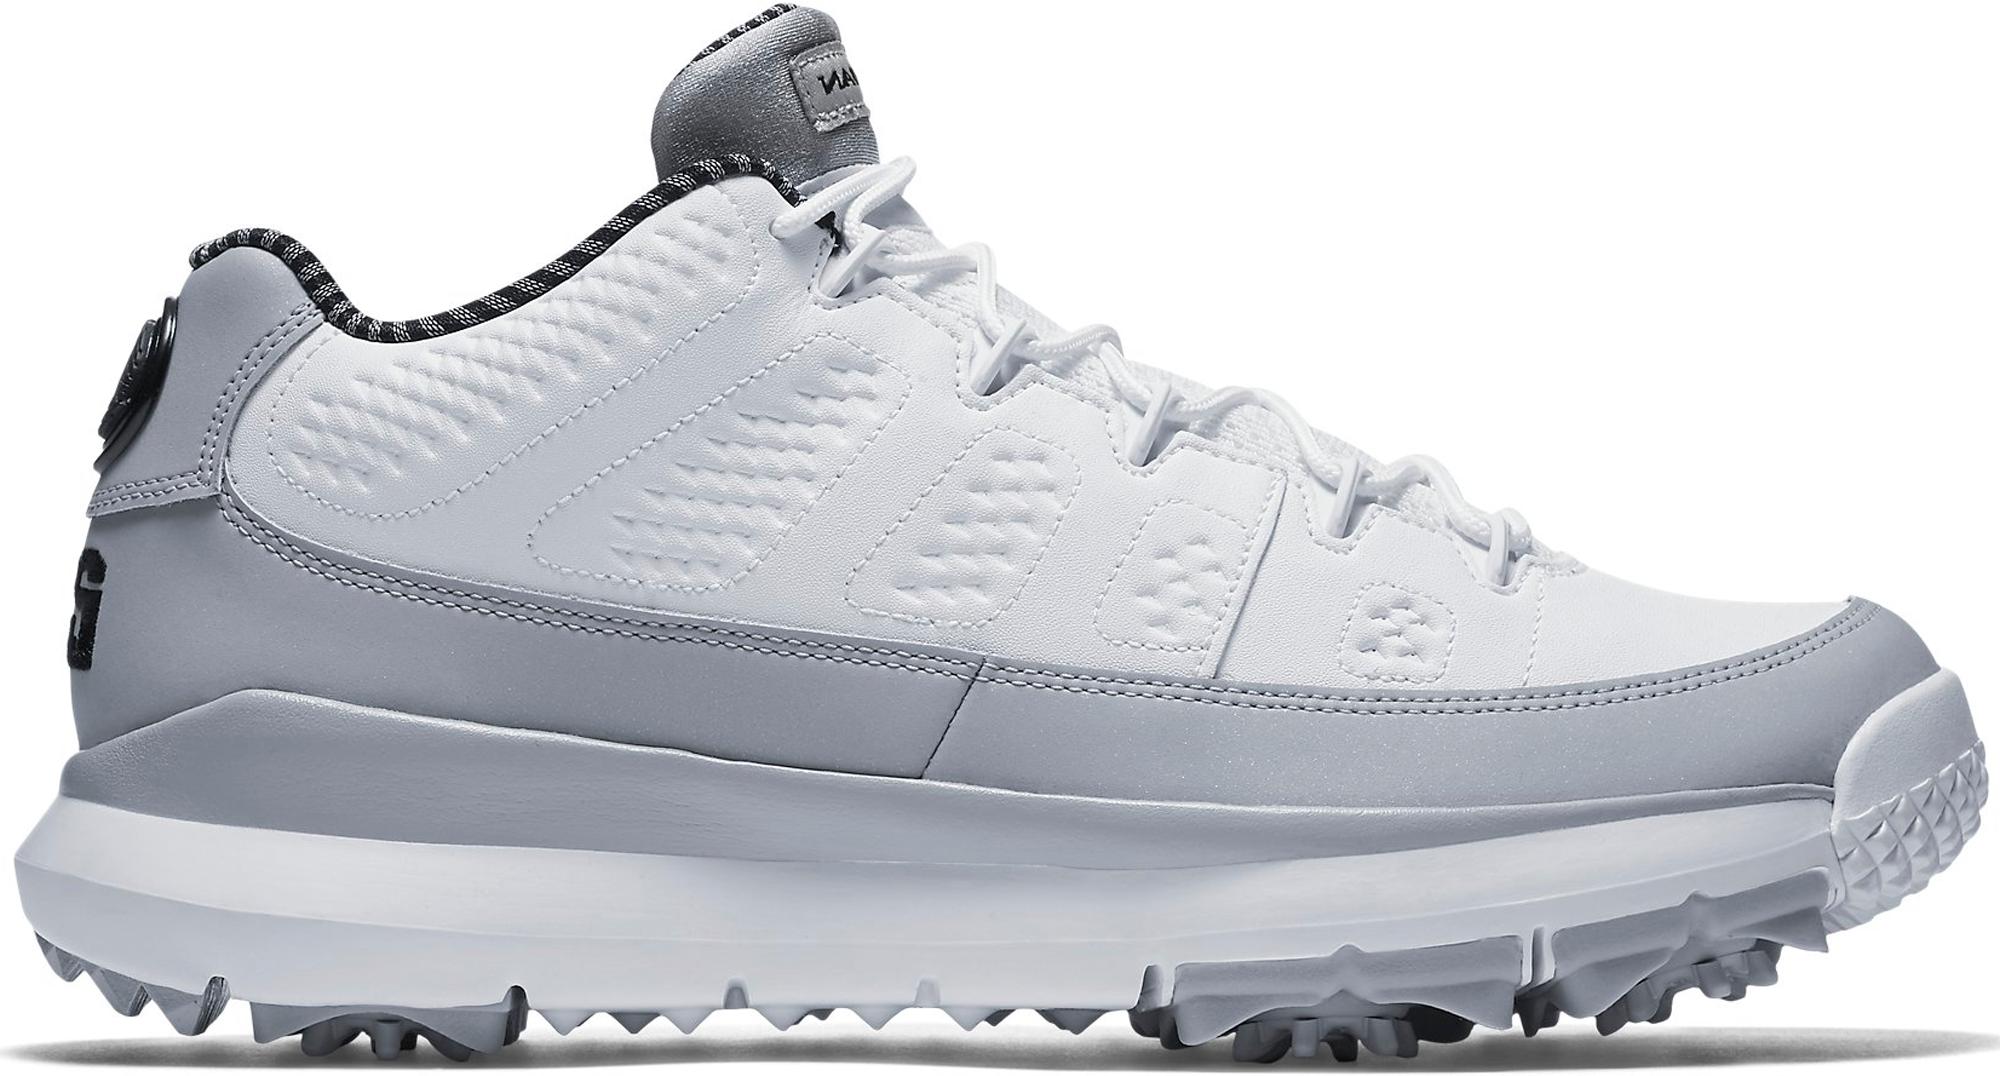 Jordan 9 Retro Golf Cleat Wolf Grey